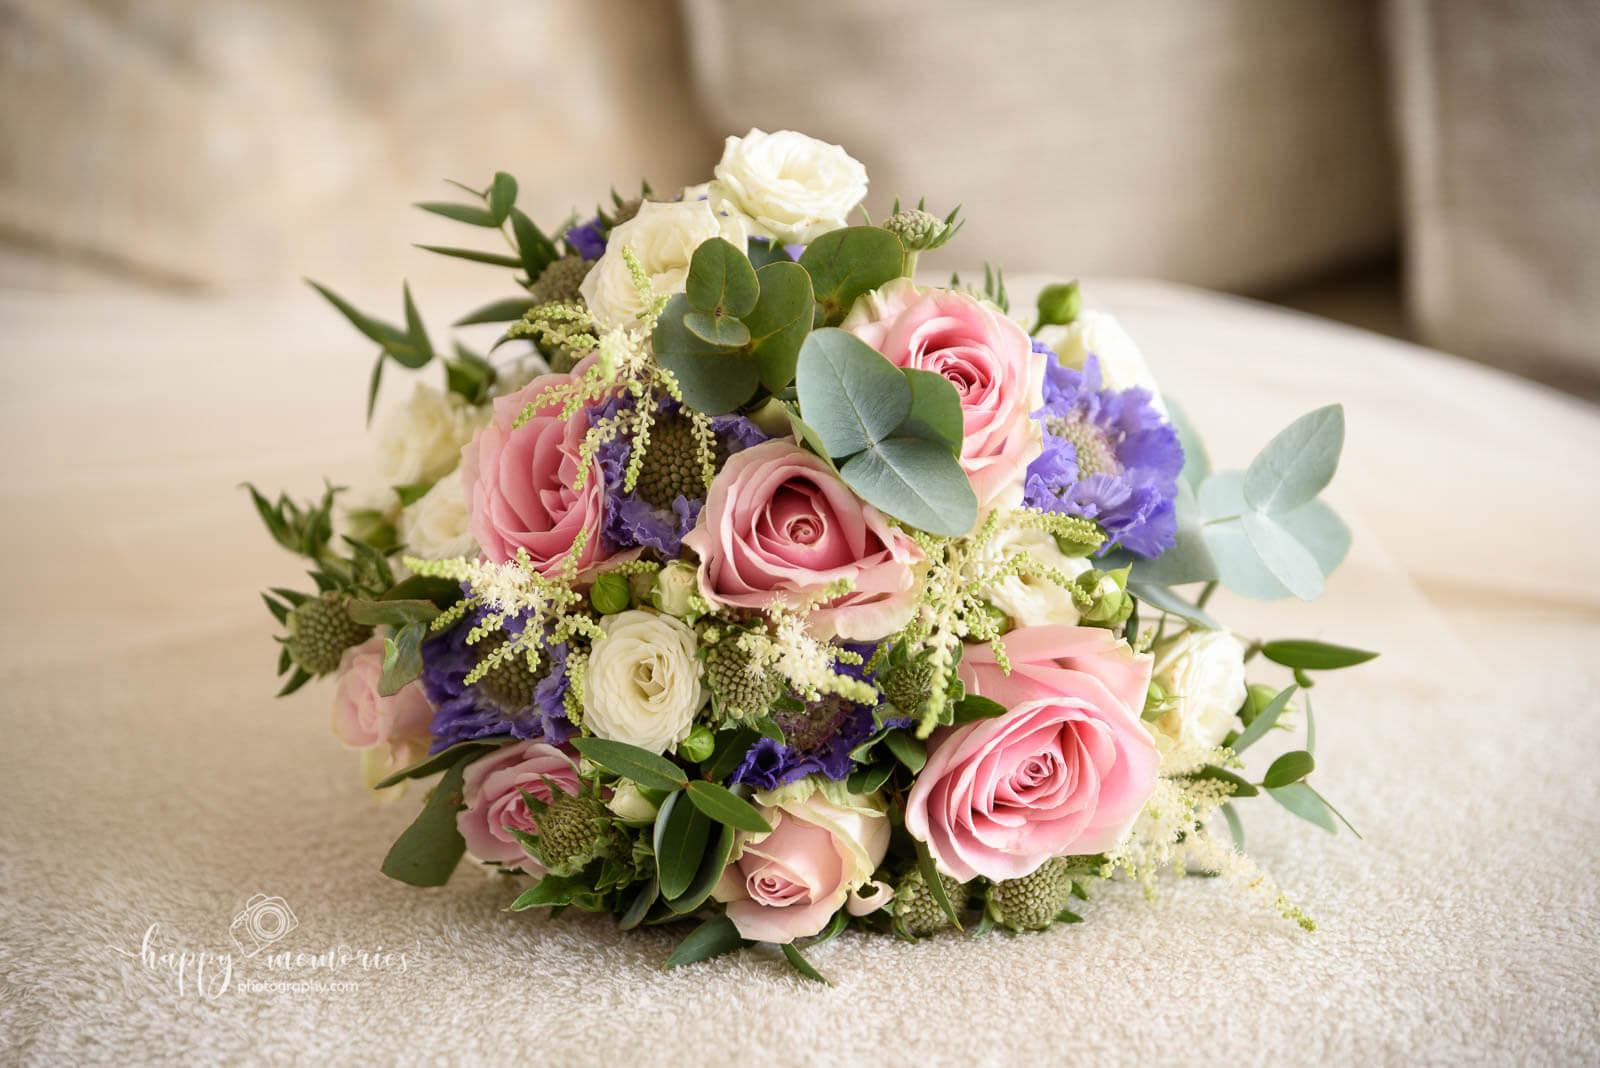 Wedding photographer East Grinstead-20